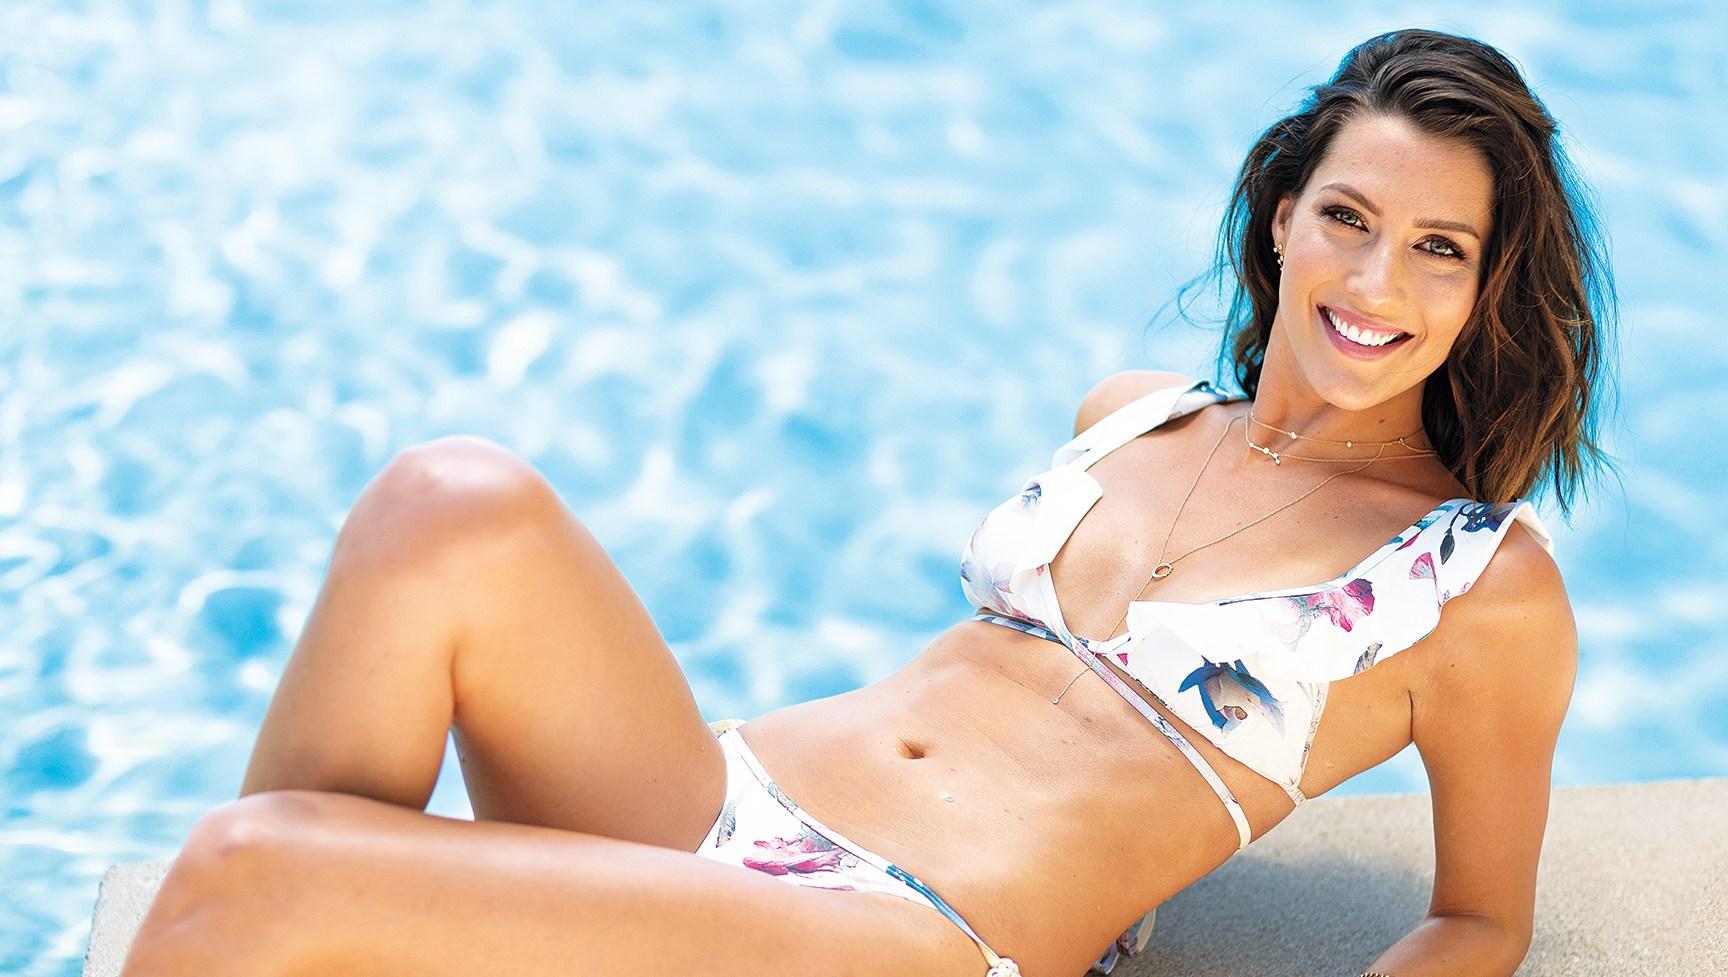 Becca Kufrin The Bachelorette bikini photo shoot